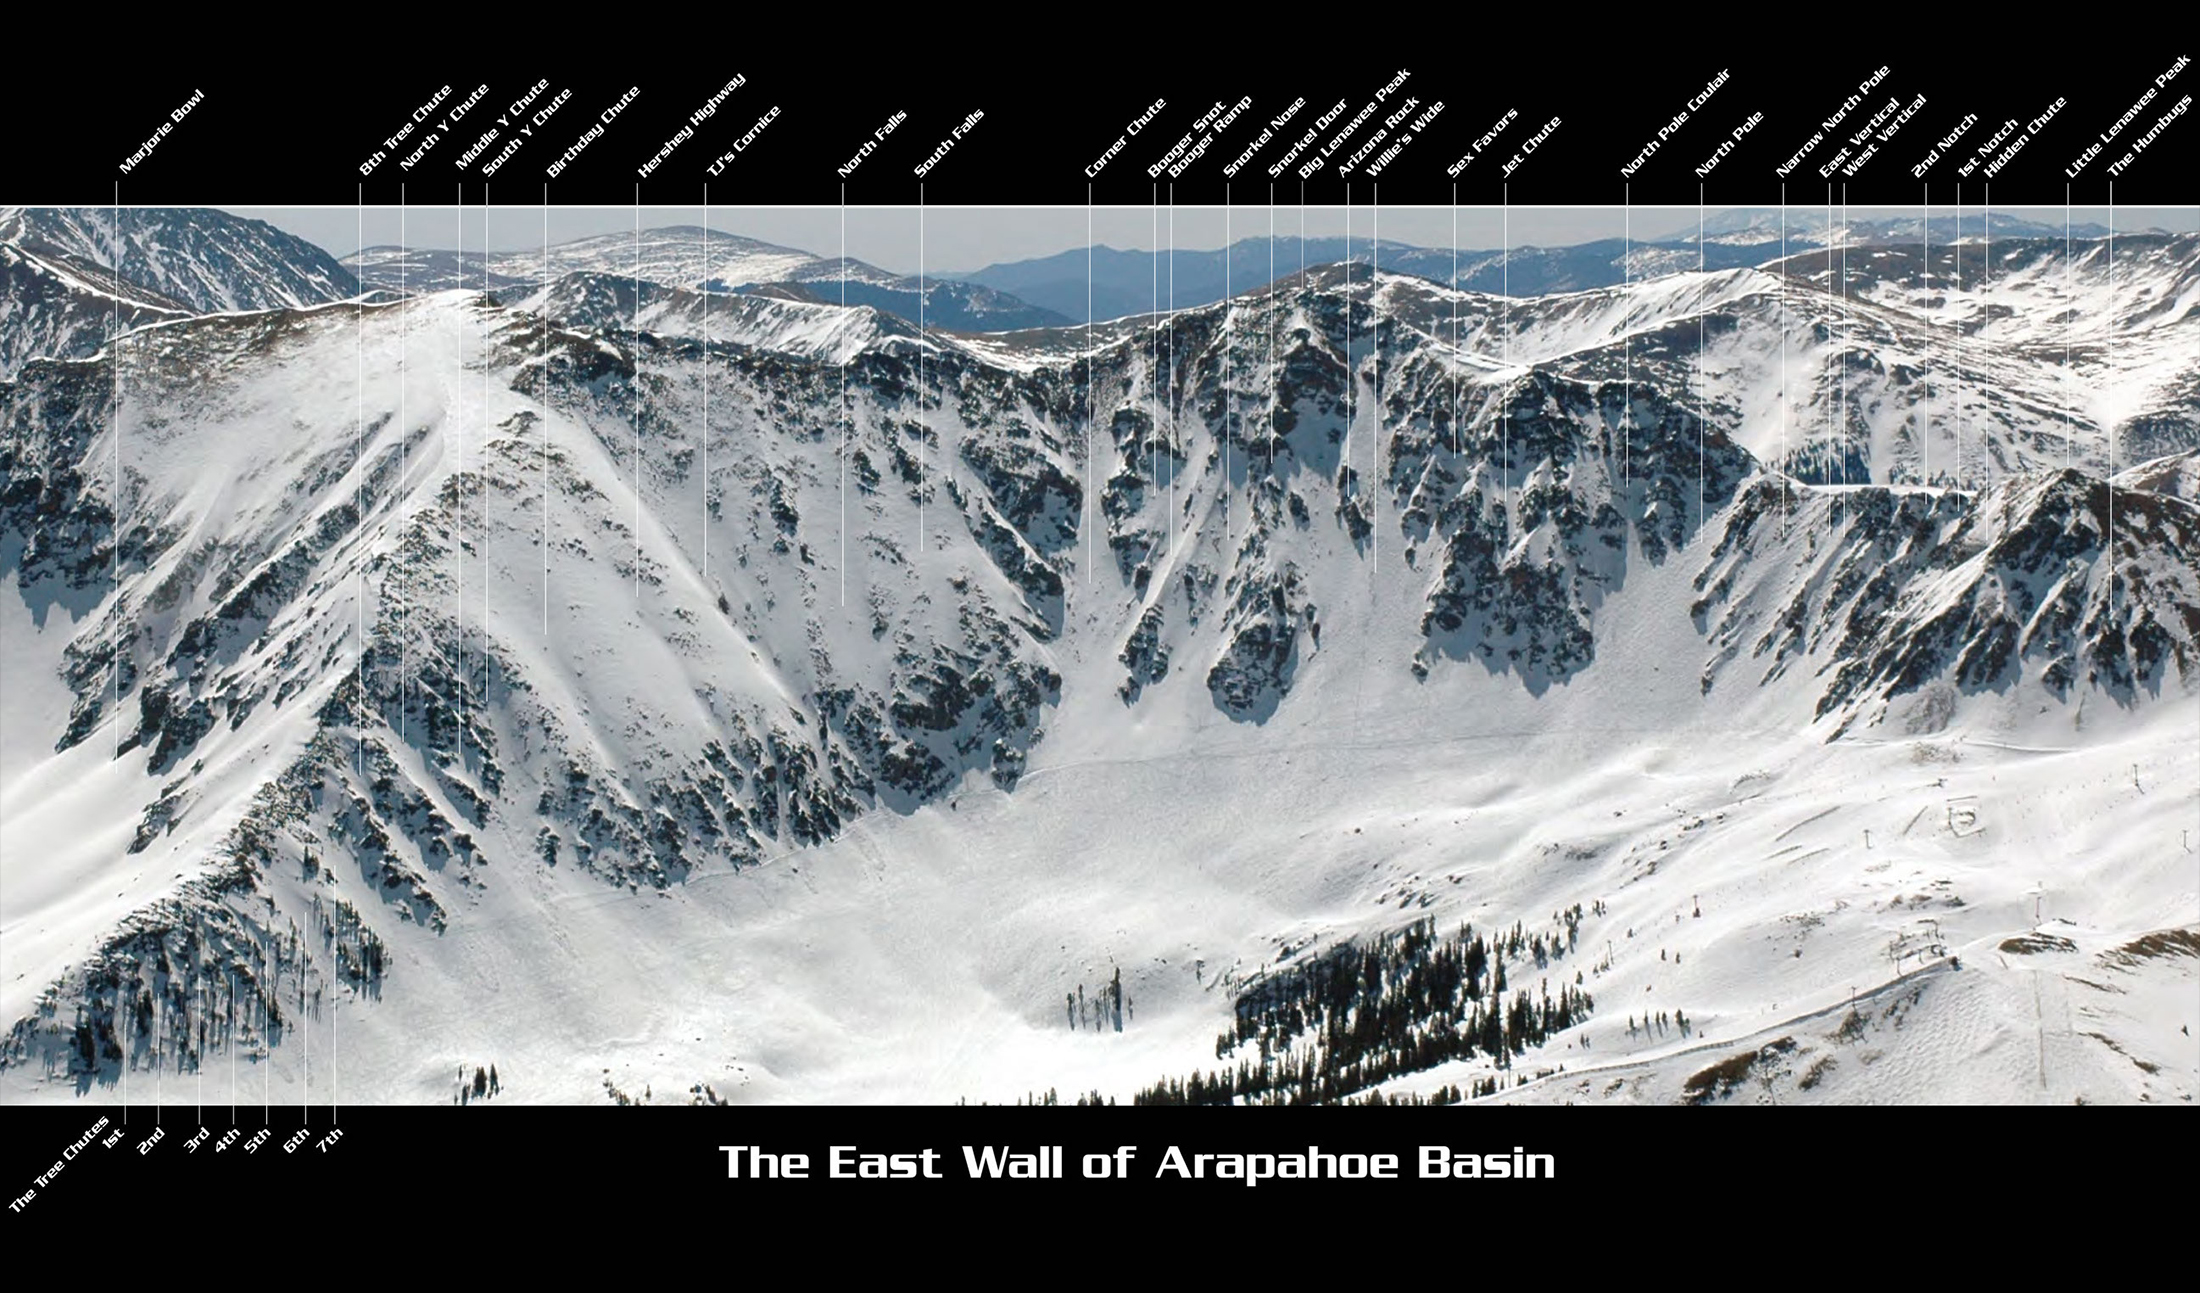 A-Basin Ski East Wall map